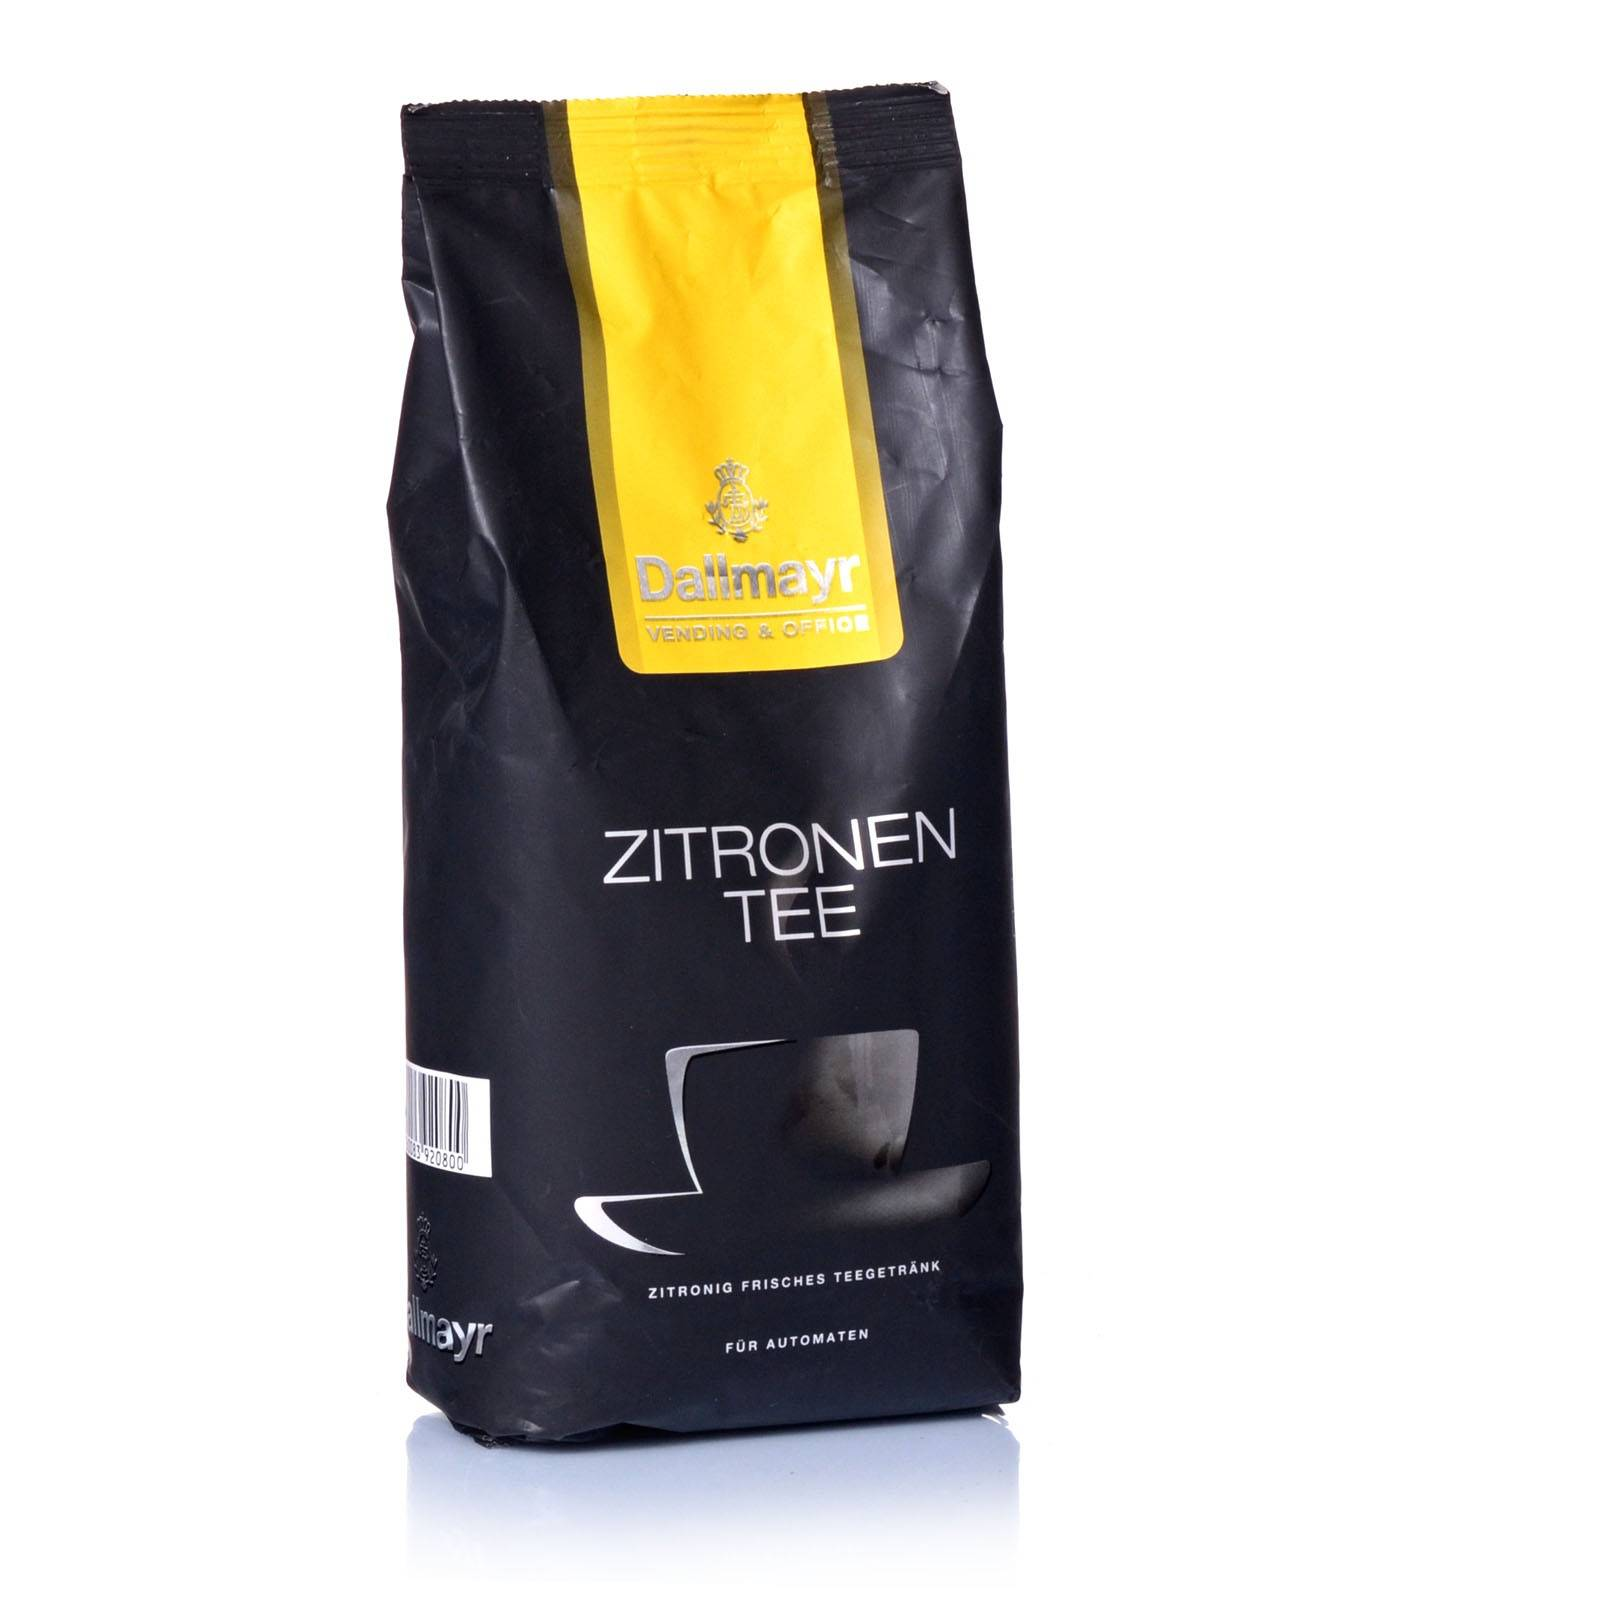 Dallmayr Zitronentee 1kg Zitronenteegetränk